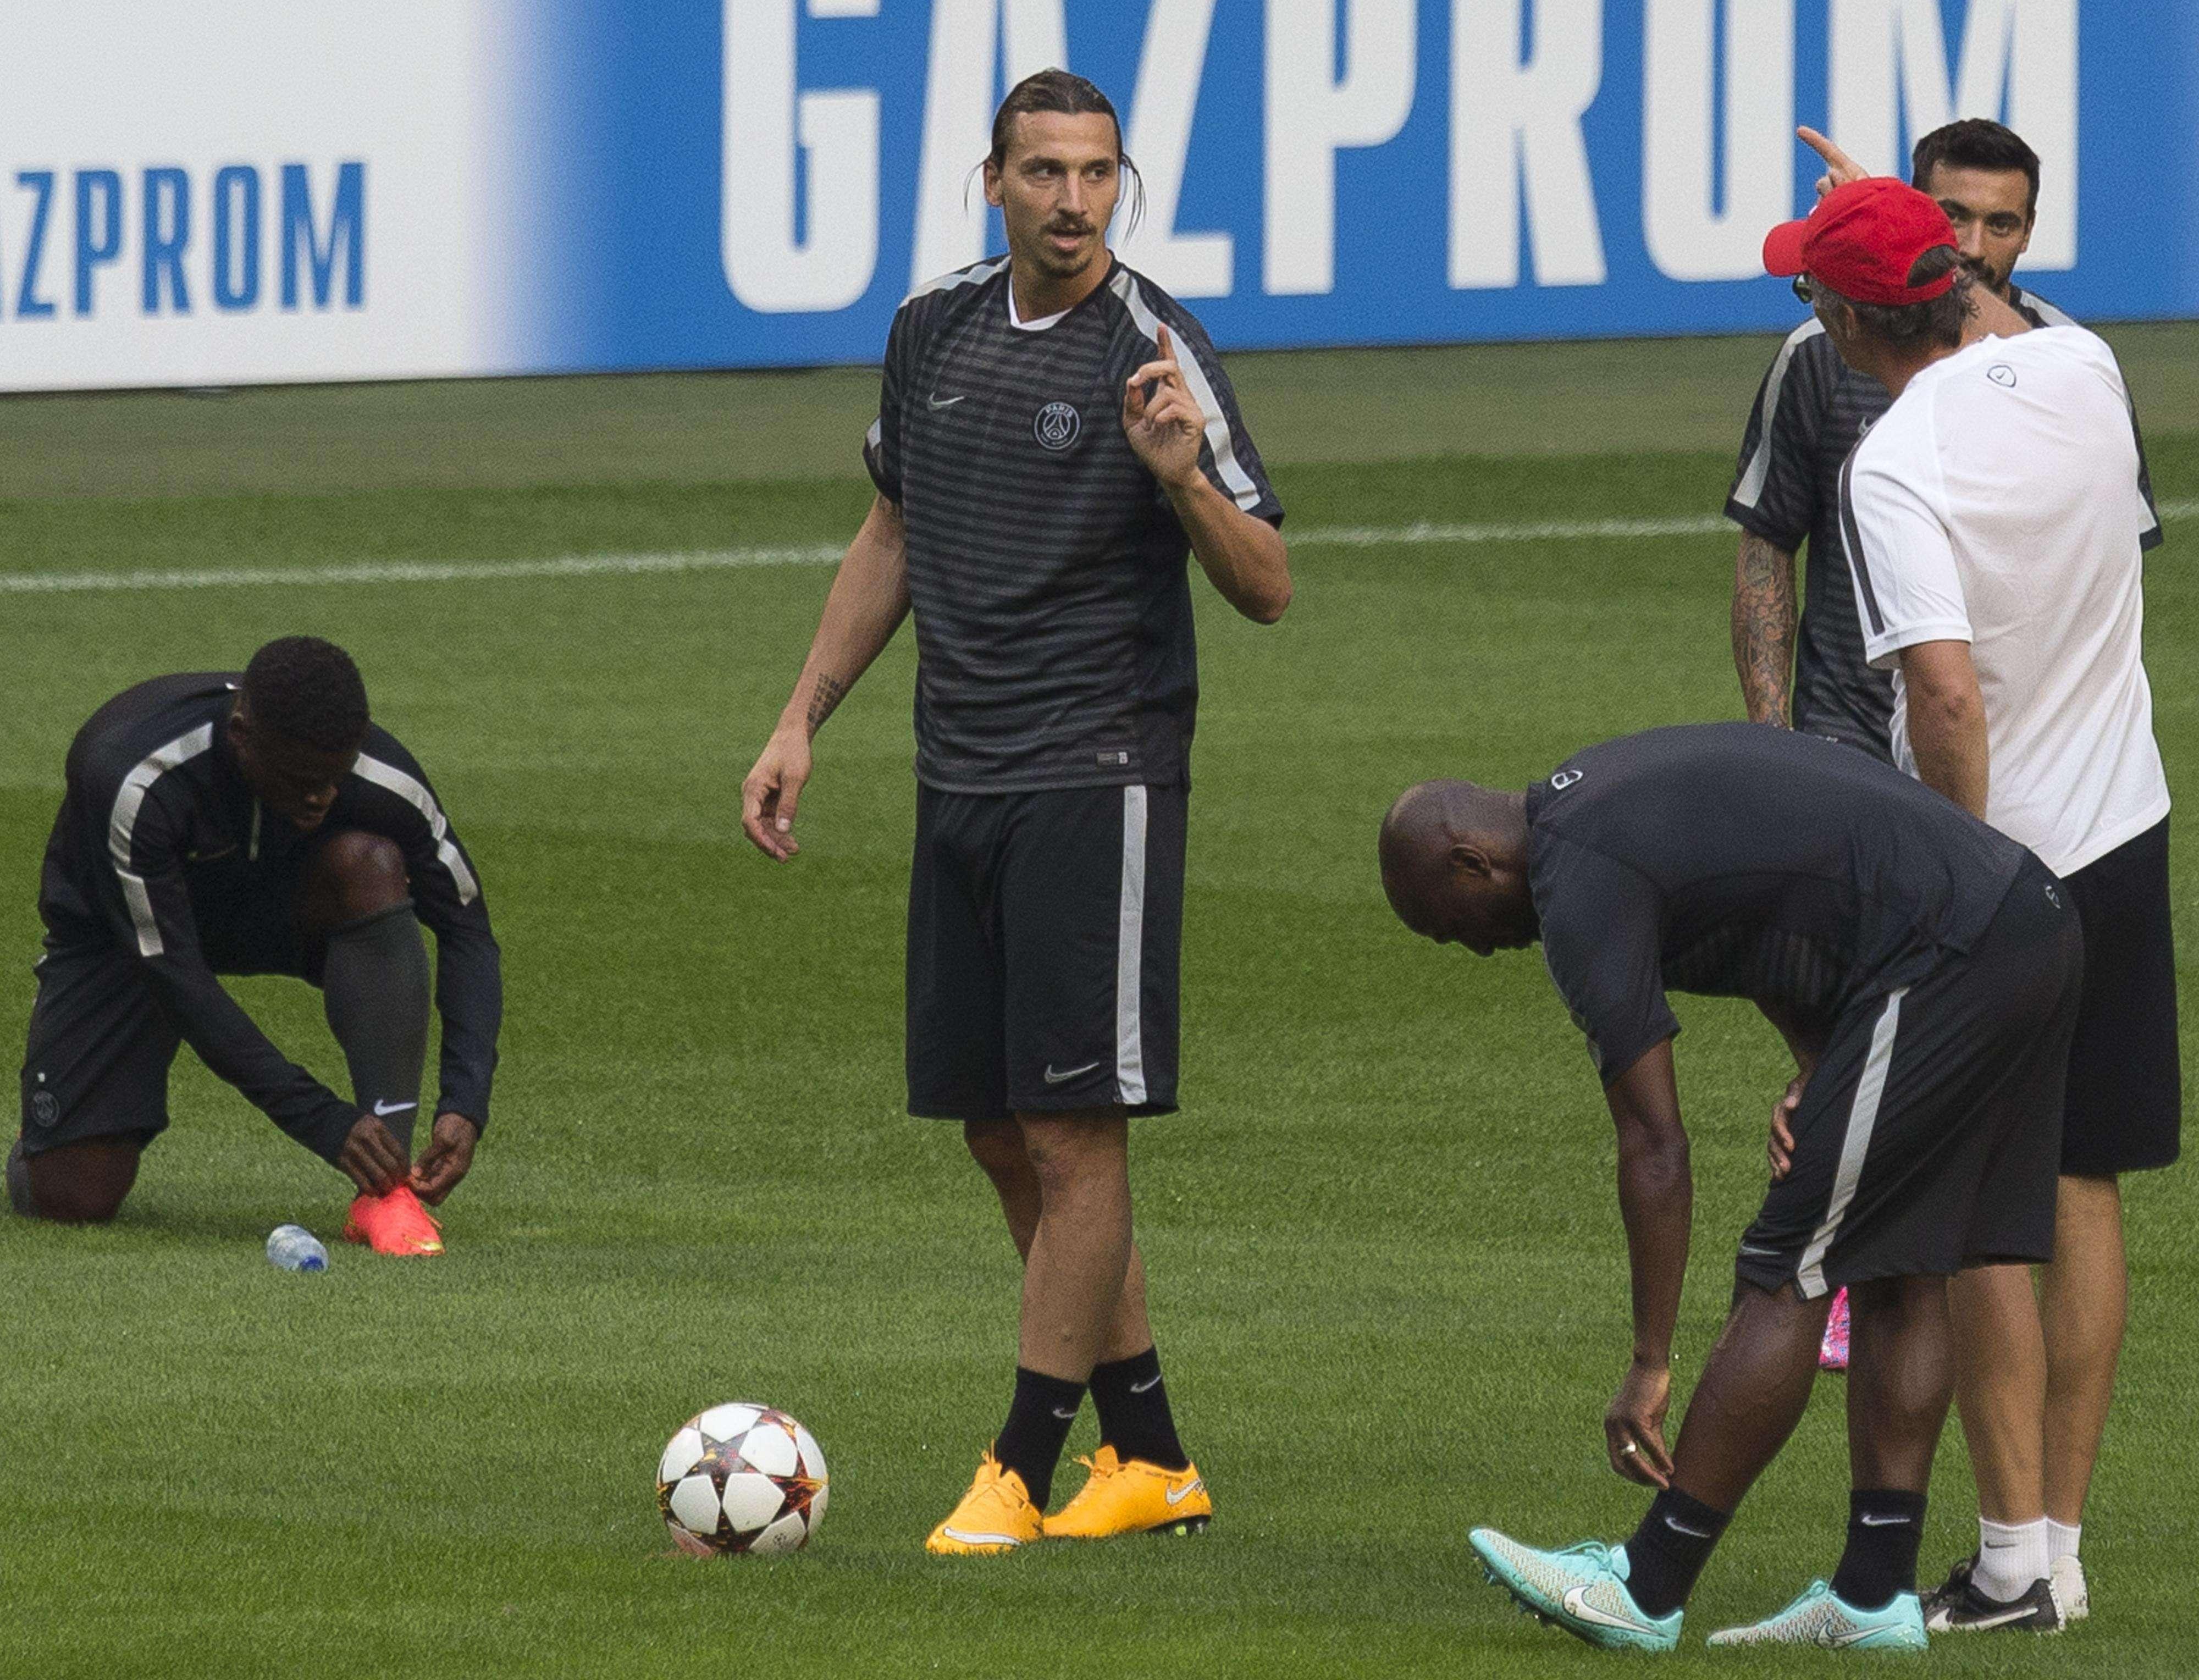 Zlatan Ibrahimovic Foto: AP Images